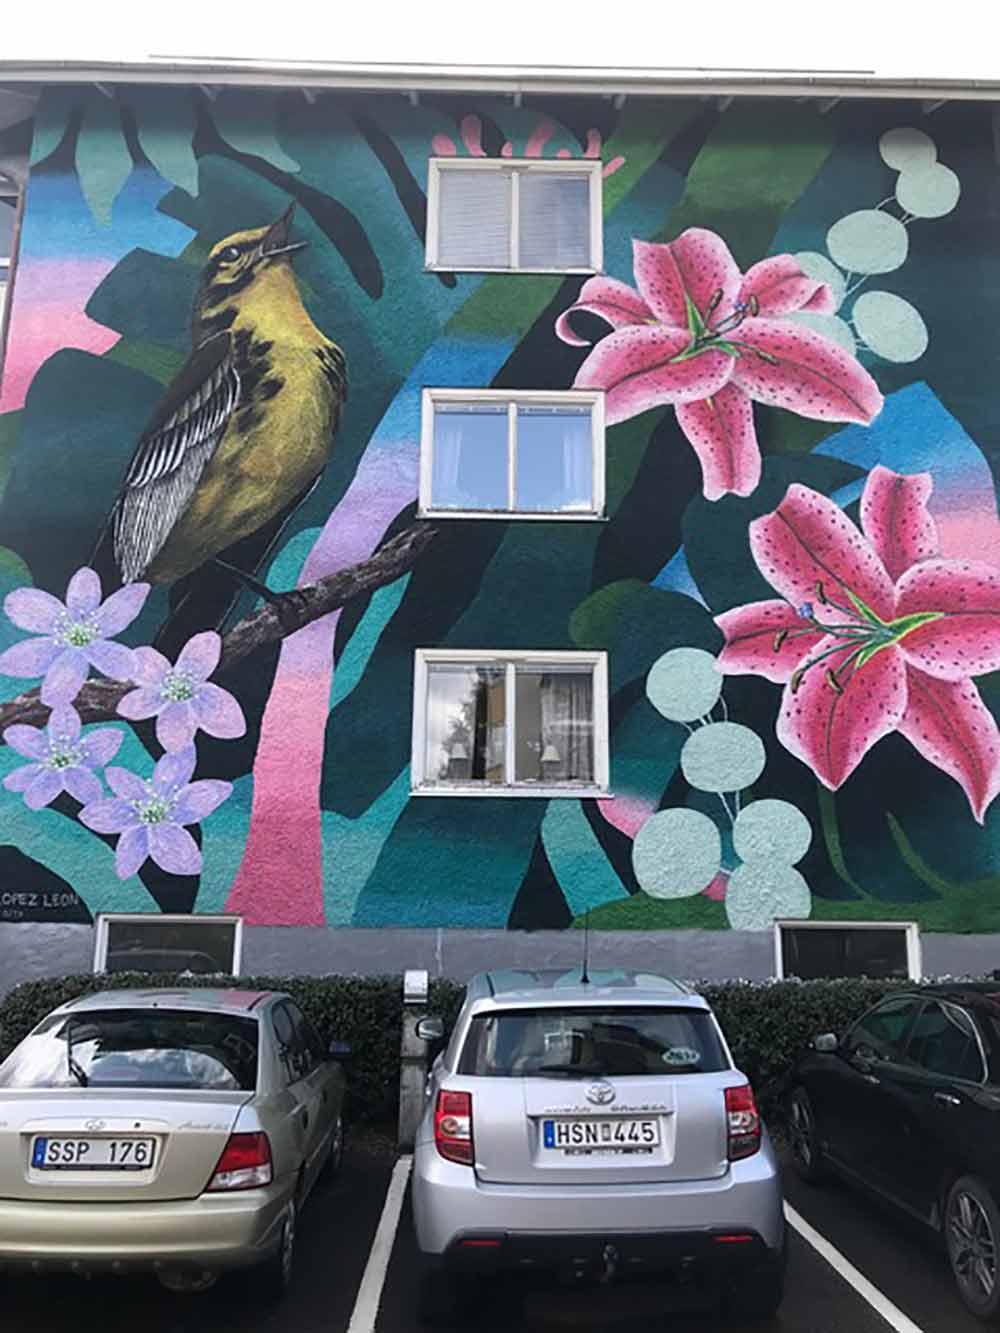 Street art. Ljusdal, Sweden. 2019. Photography by Mona Livholts